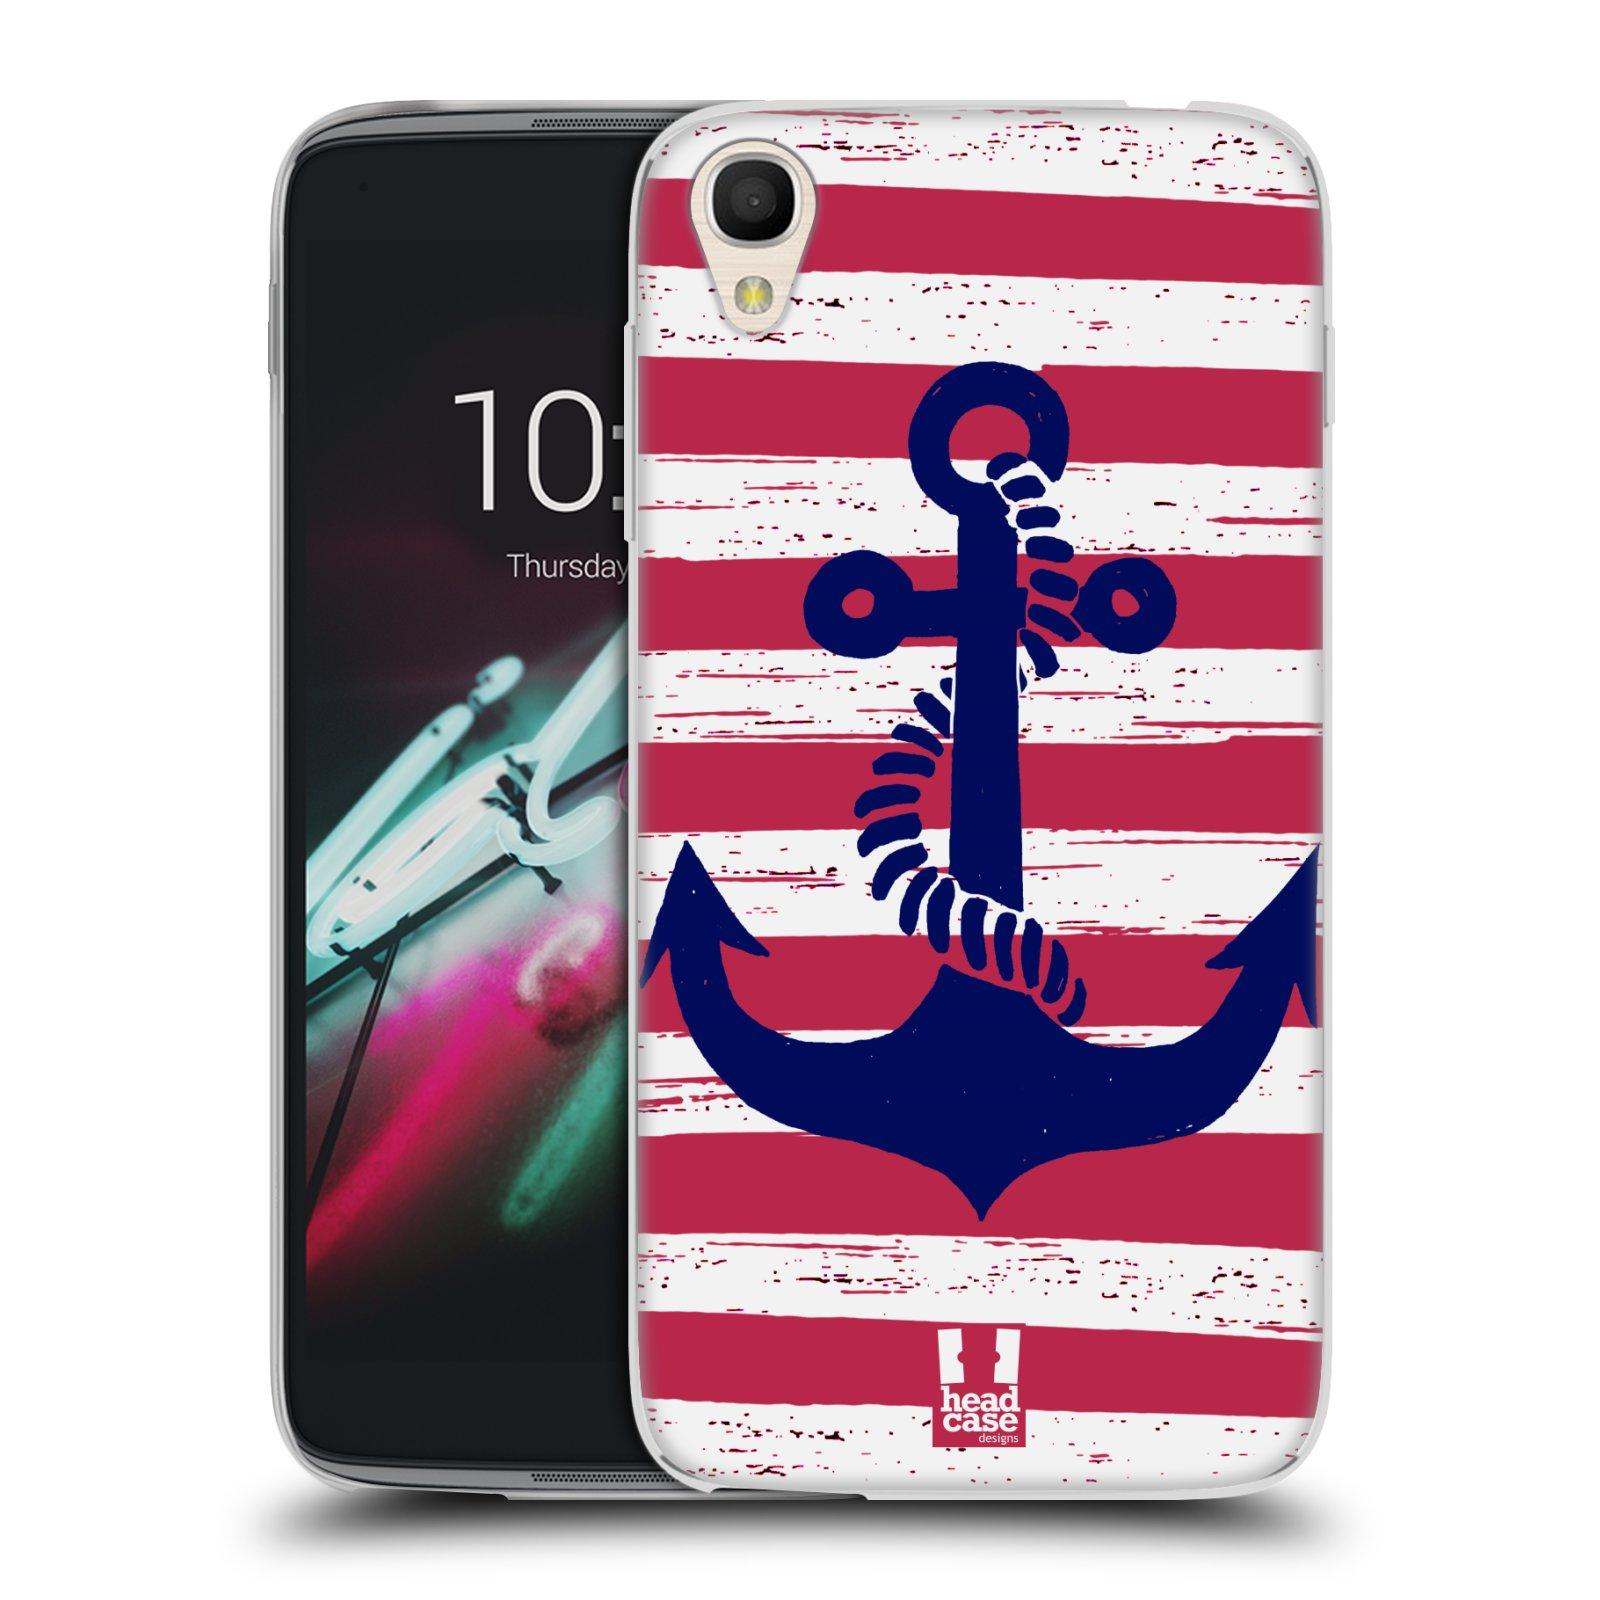 "Silikonové pouzdro na mobil Alcatel One Touch 6039Y Idol 3 HEAD CASE KOTVA S PRUHY (Silikonový kryt či obal na mobilní telefon Alcatel One Touch Idol 3 OT-6039Y s 4,7"" displejem)"